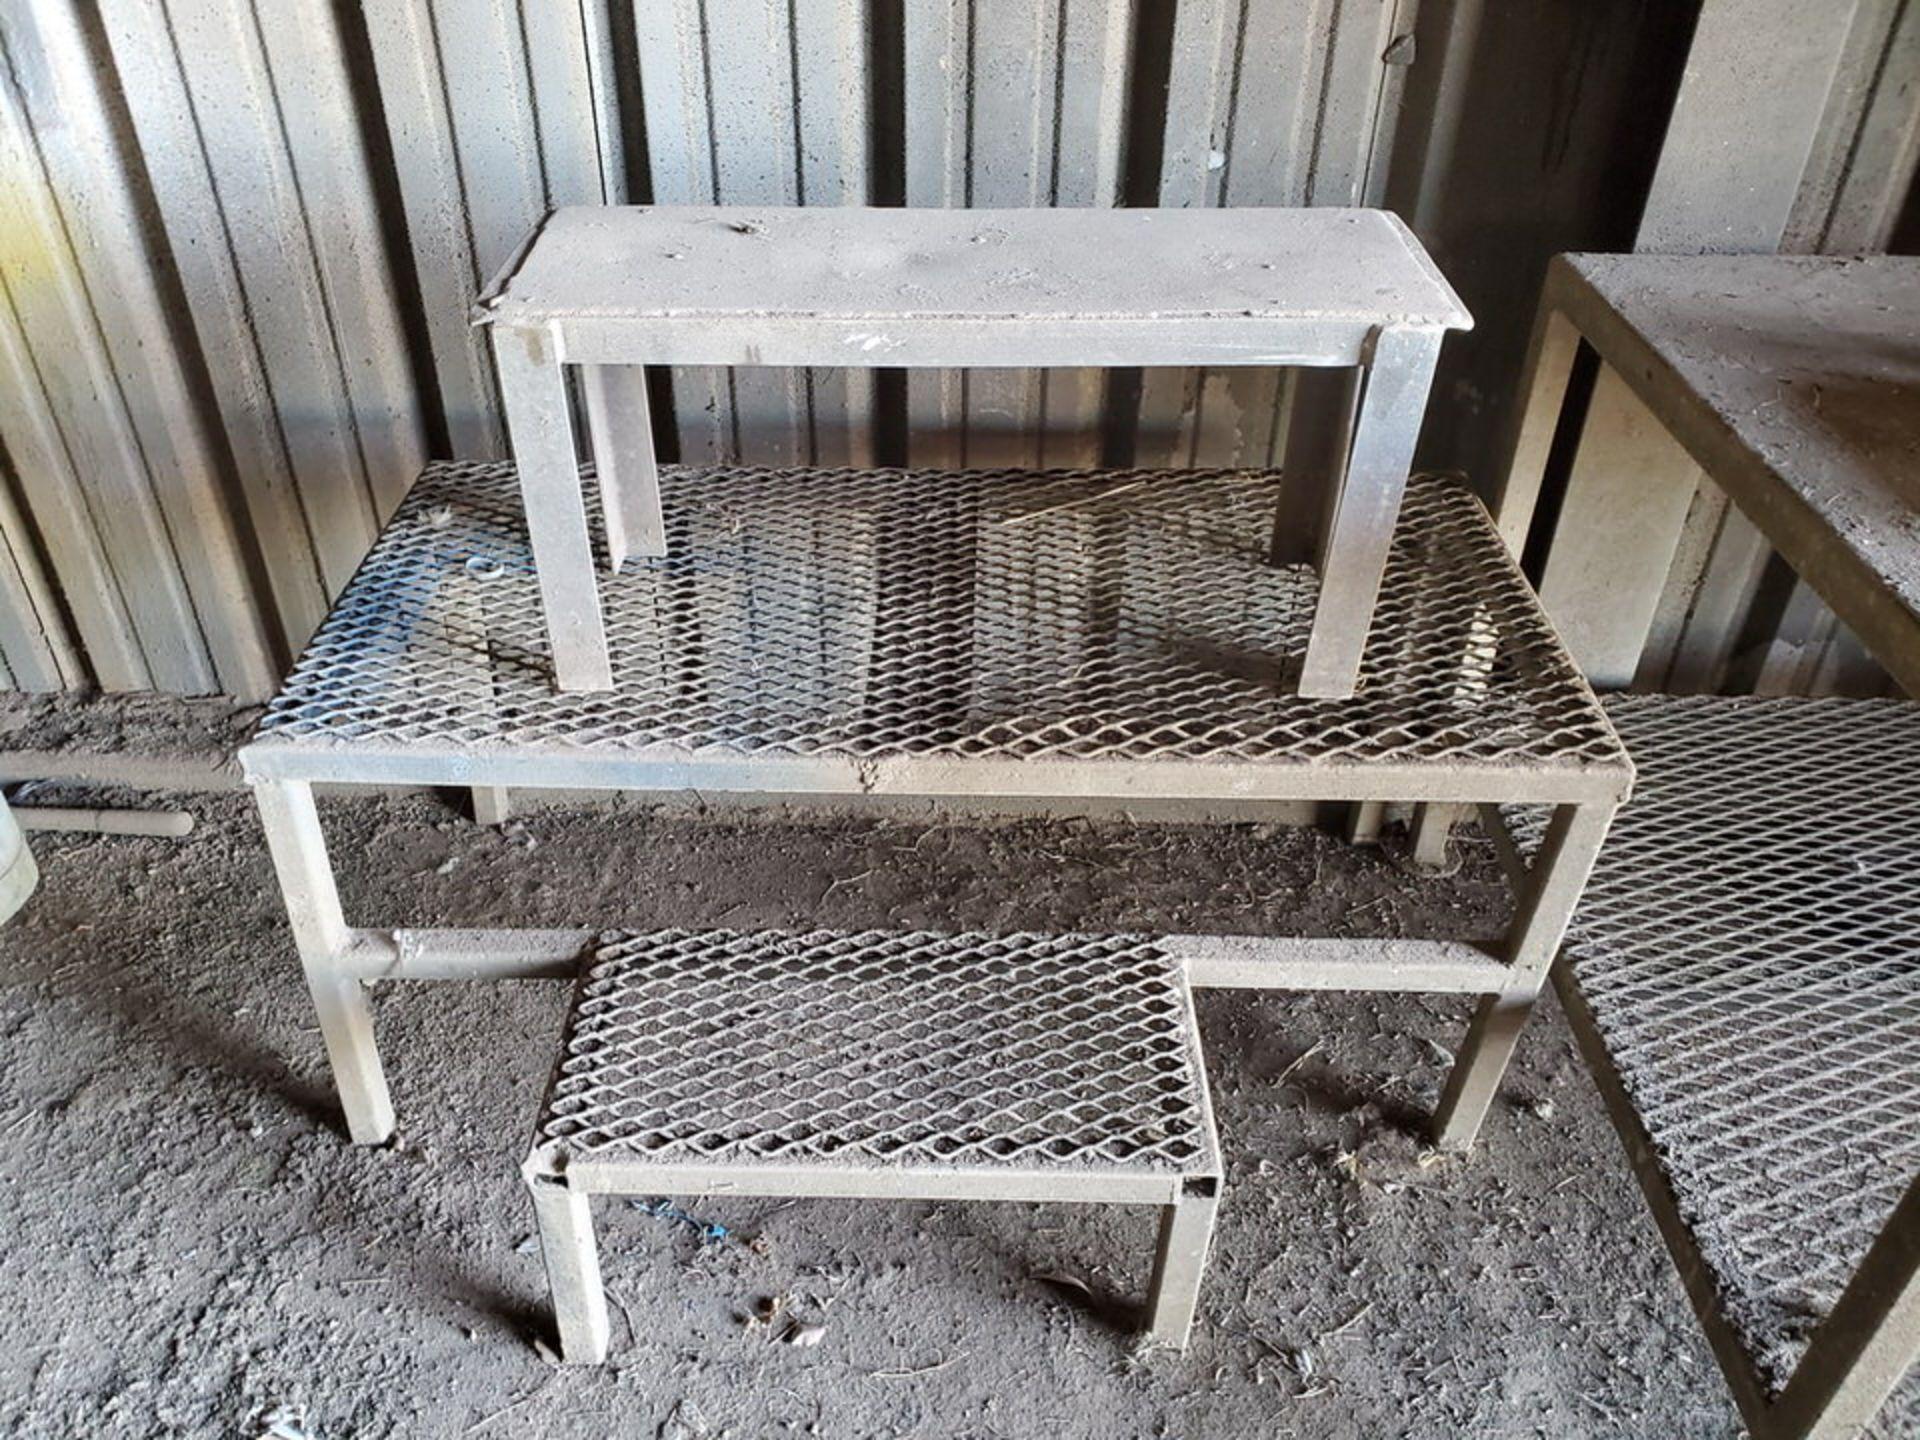 "Table & Platforms Size Range: 12"" x 30"" x 14"" - 40"" x 72"" x 33""; W/ Creeper Seat - Image 5 of 5"